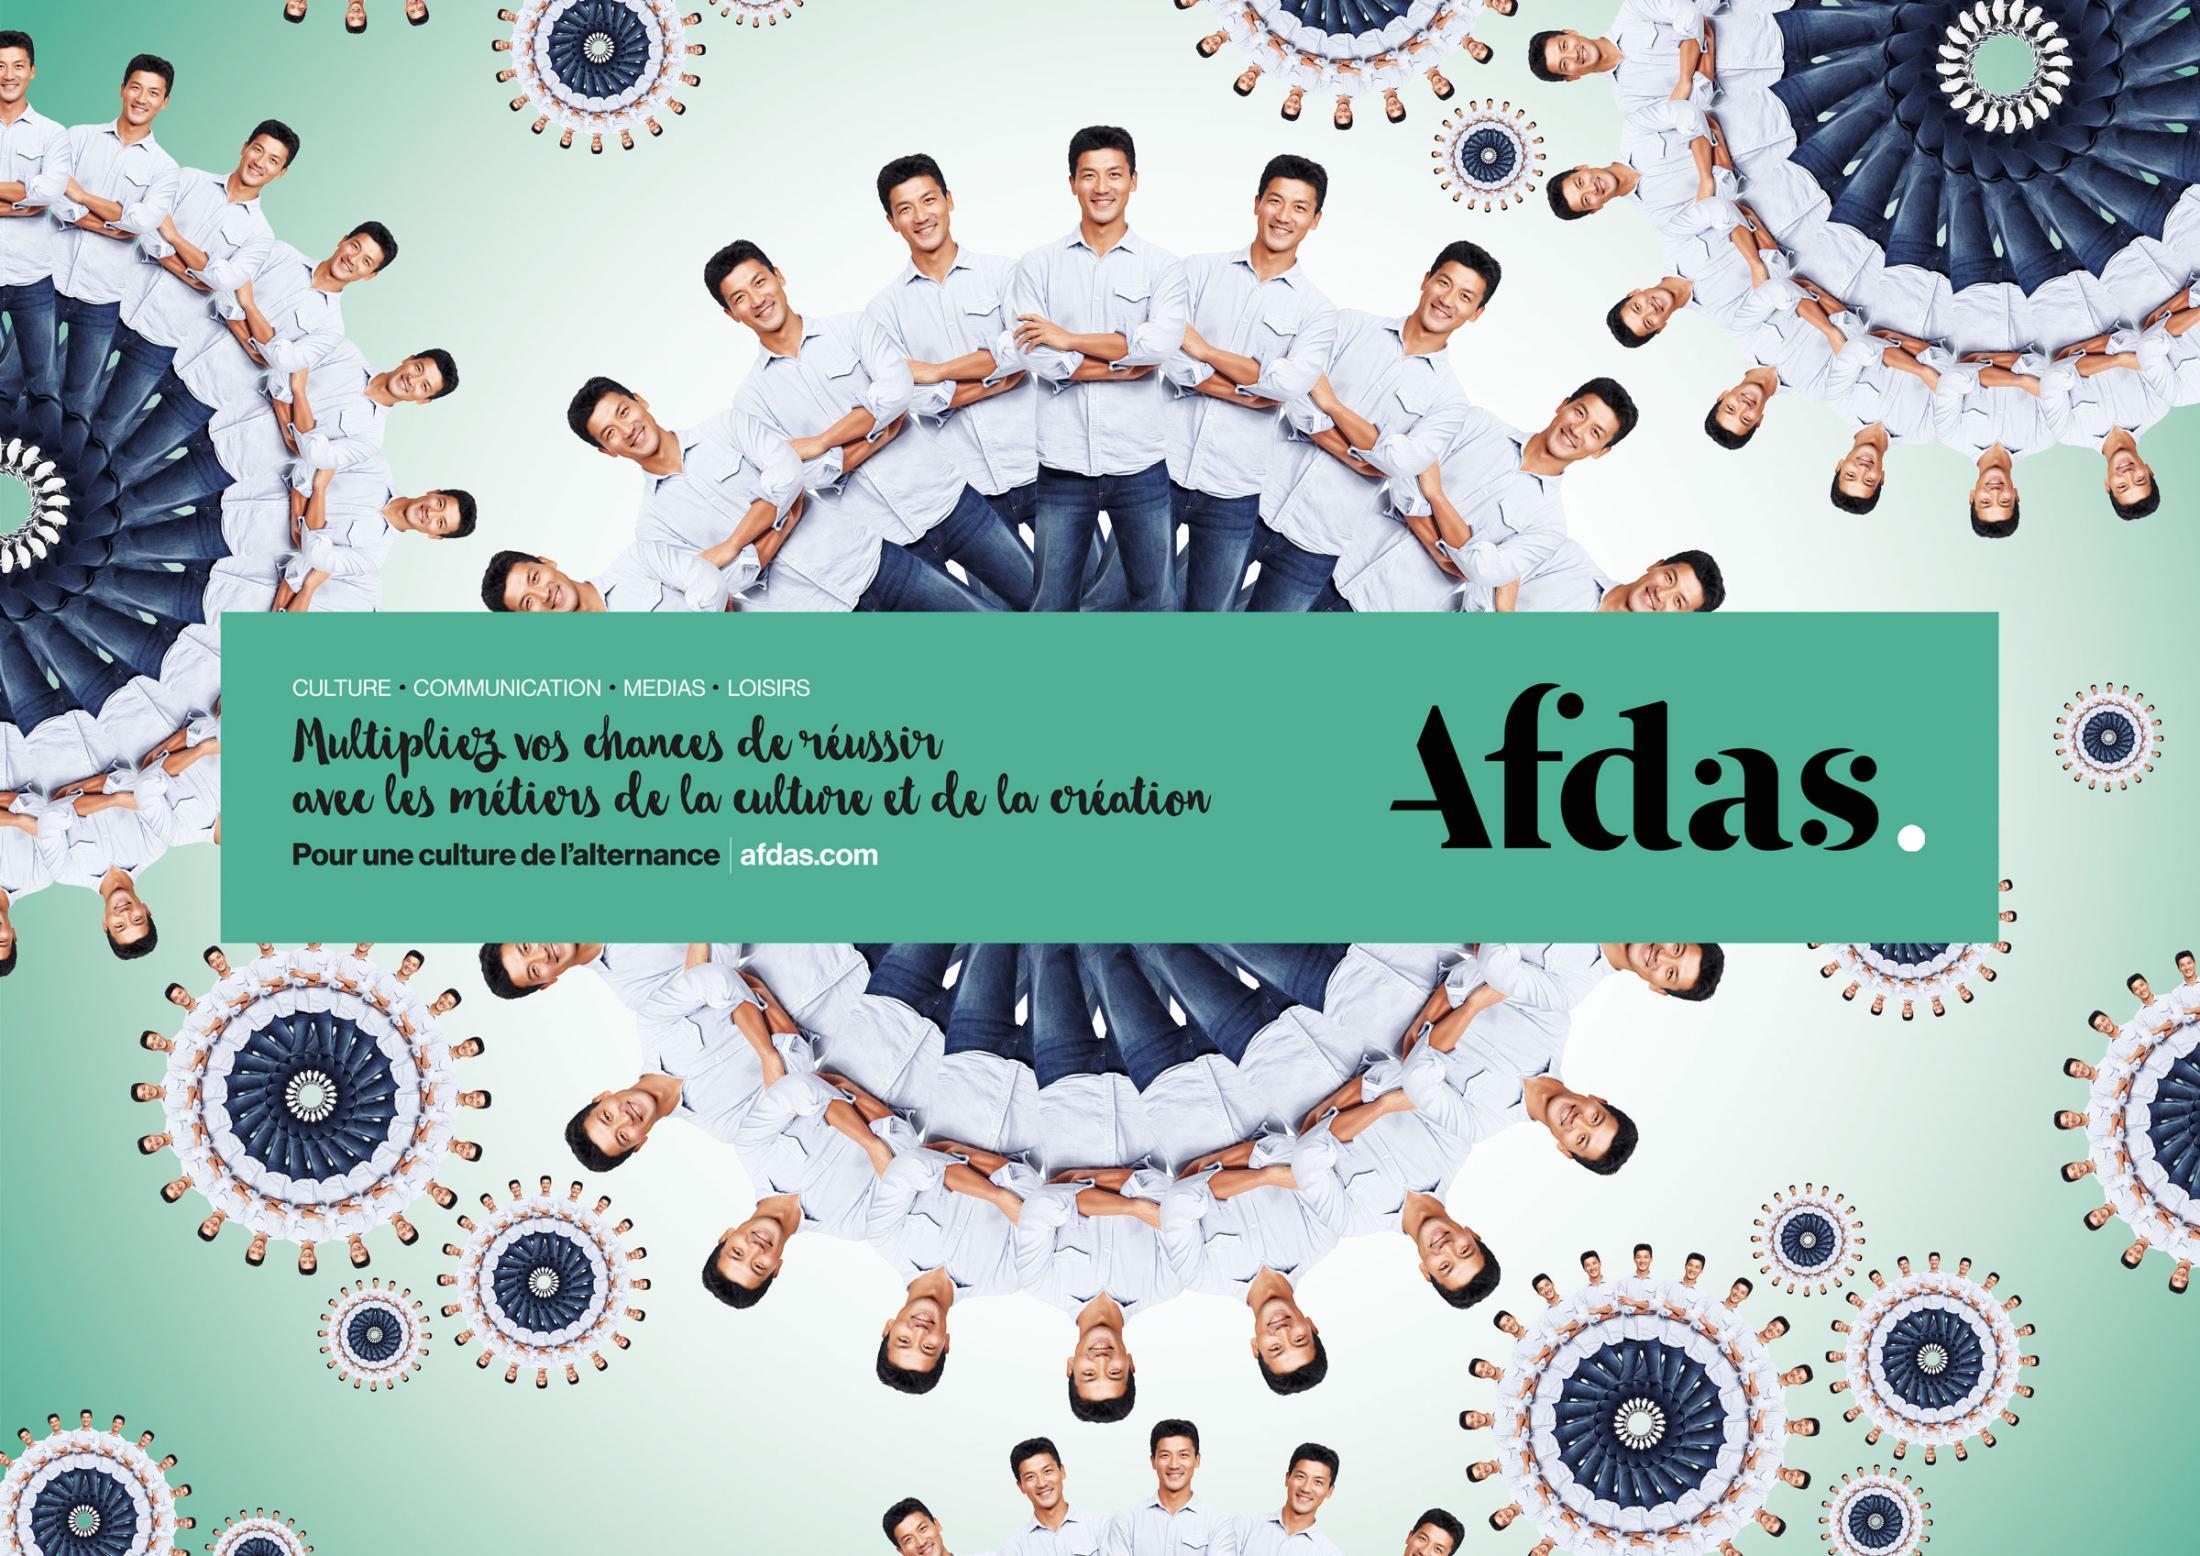 Afdas Print Ad - Multiply, 3